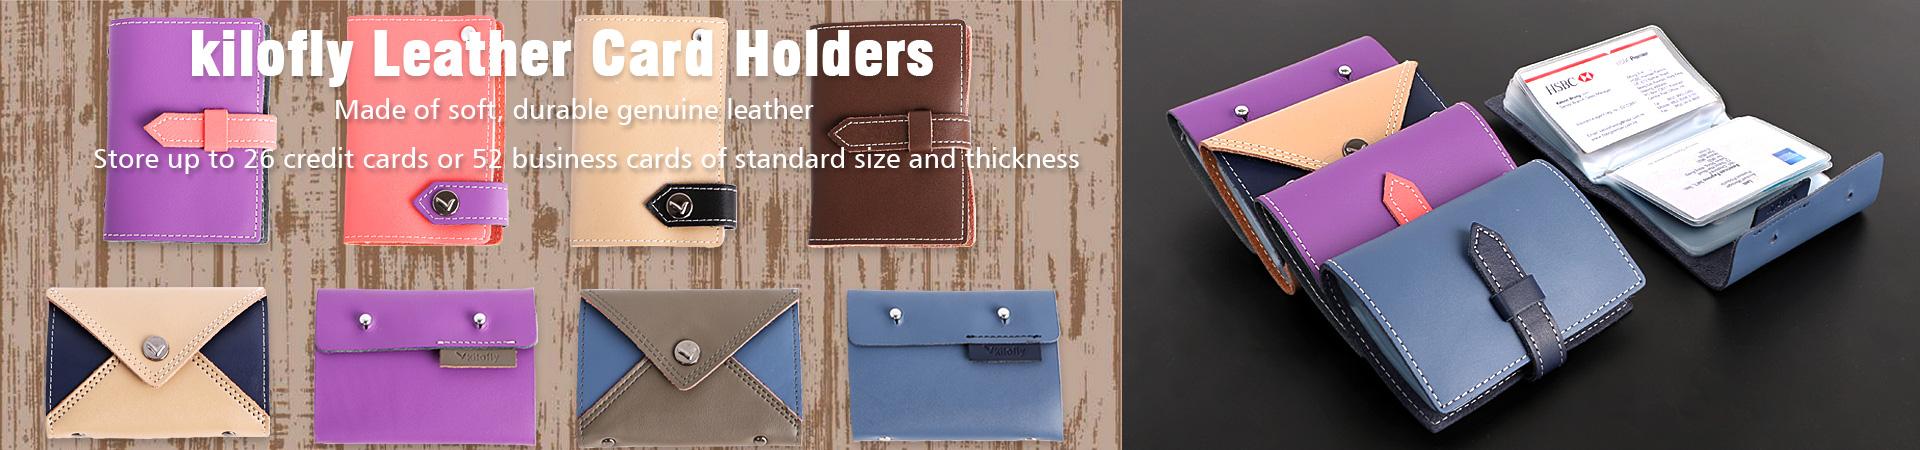 kilofly leather card holder